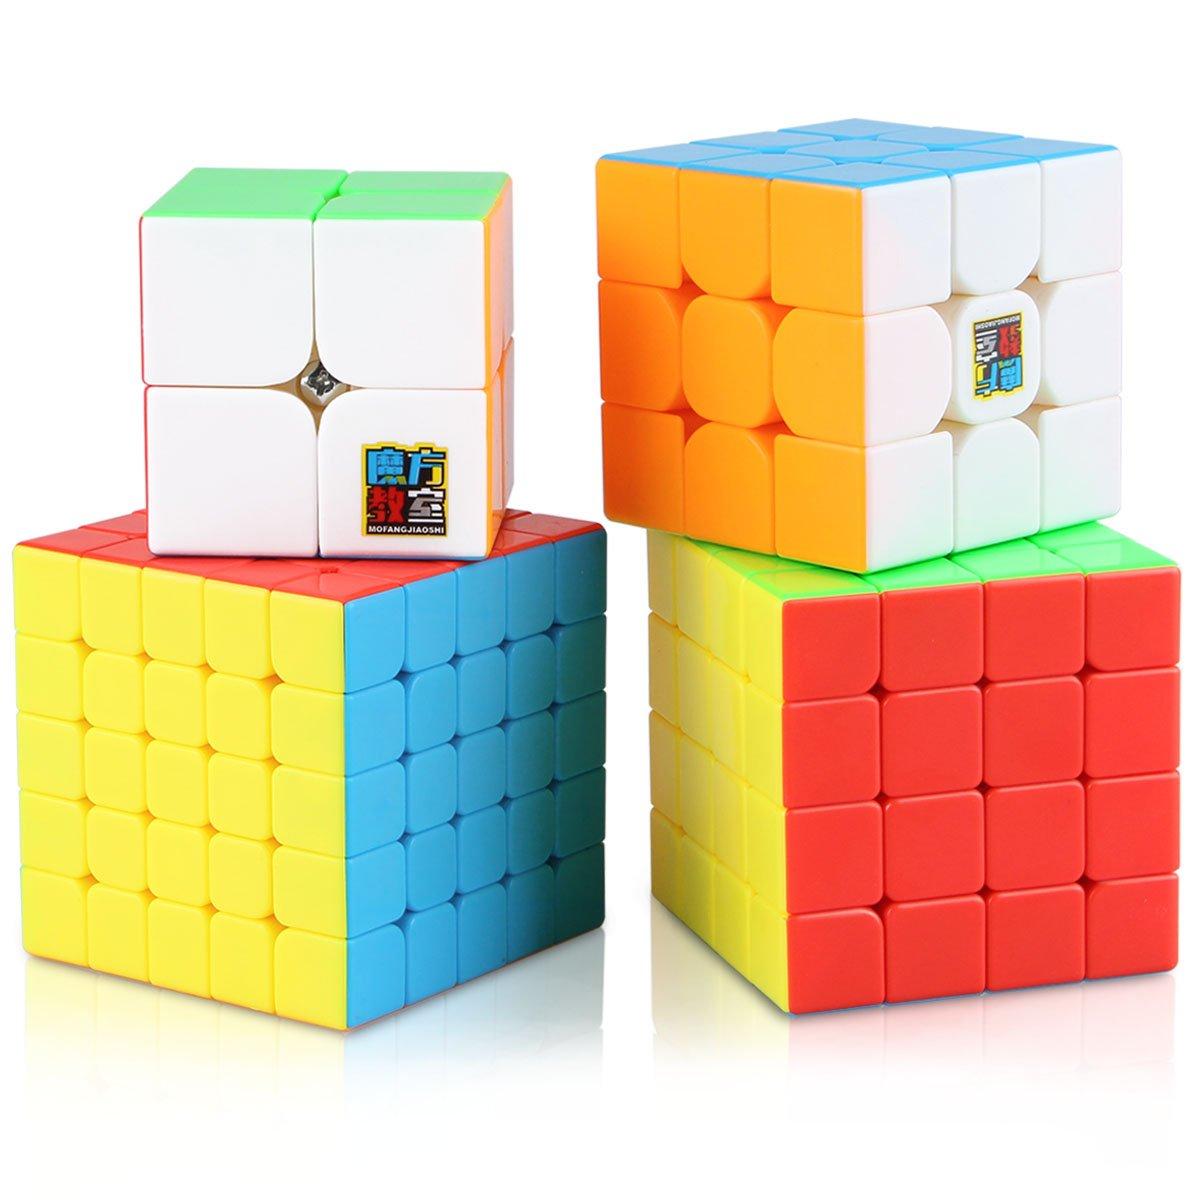 Aitey Speed Cube Set, Moyu Cube Bundle MF2S 2x2 3x3 4x4 5x5 Stickerless  Magic Cube Puzzle Toys for Kids Gift Box (4 Pack)